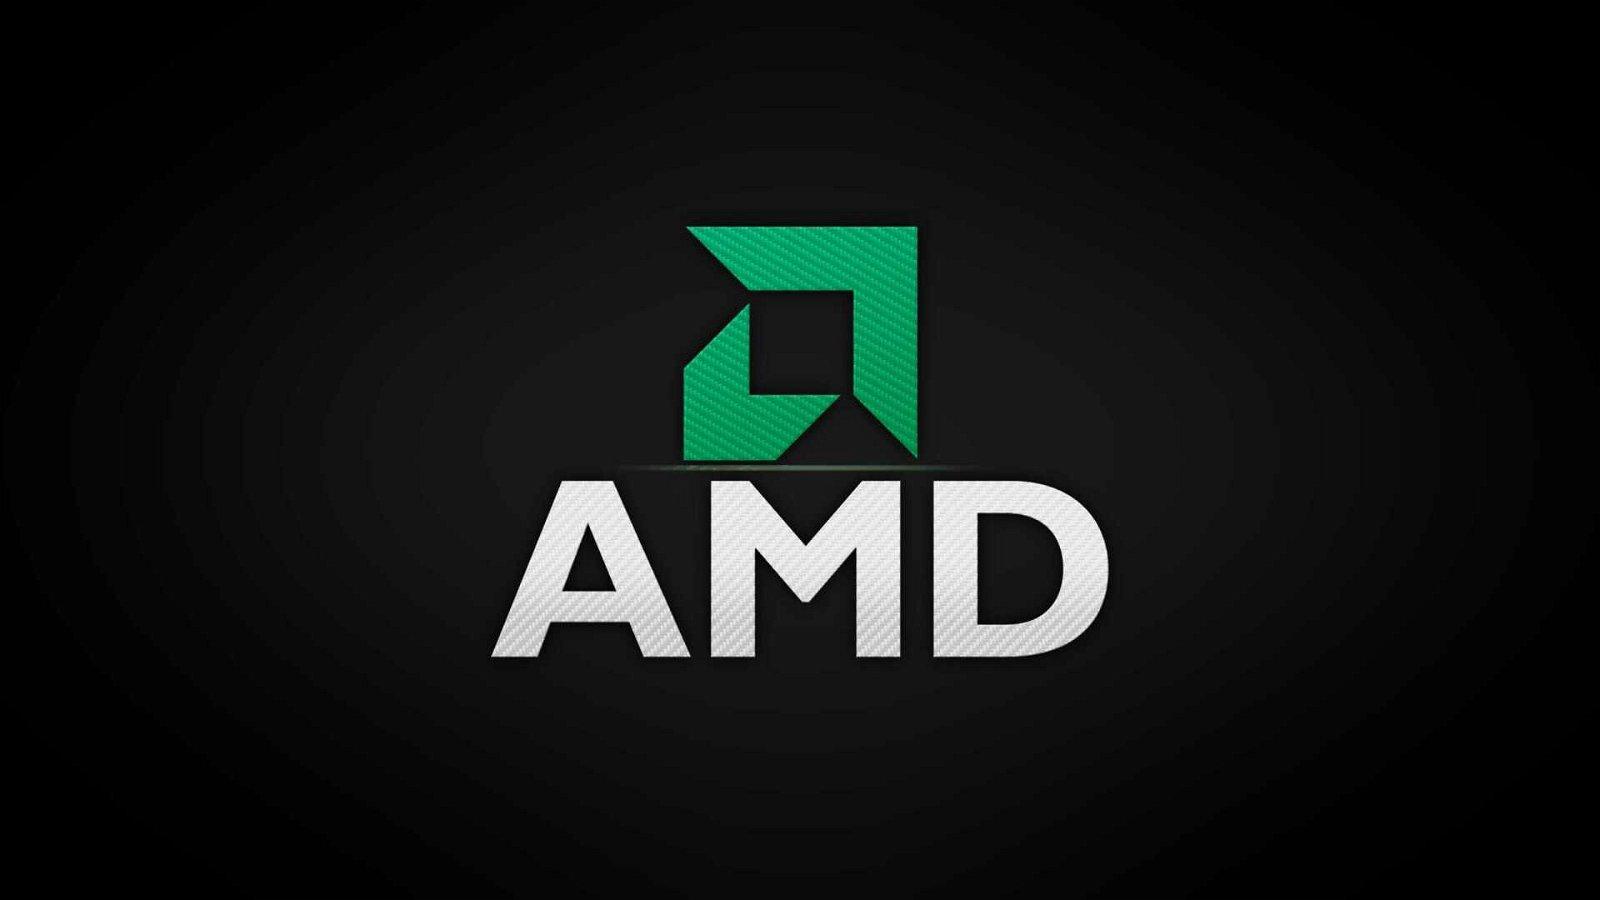 AMD Announces Client Compute Leadership Updates